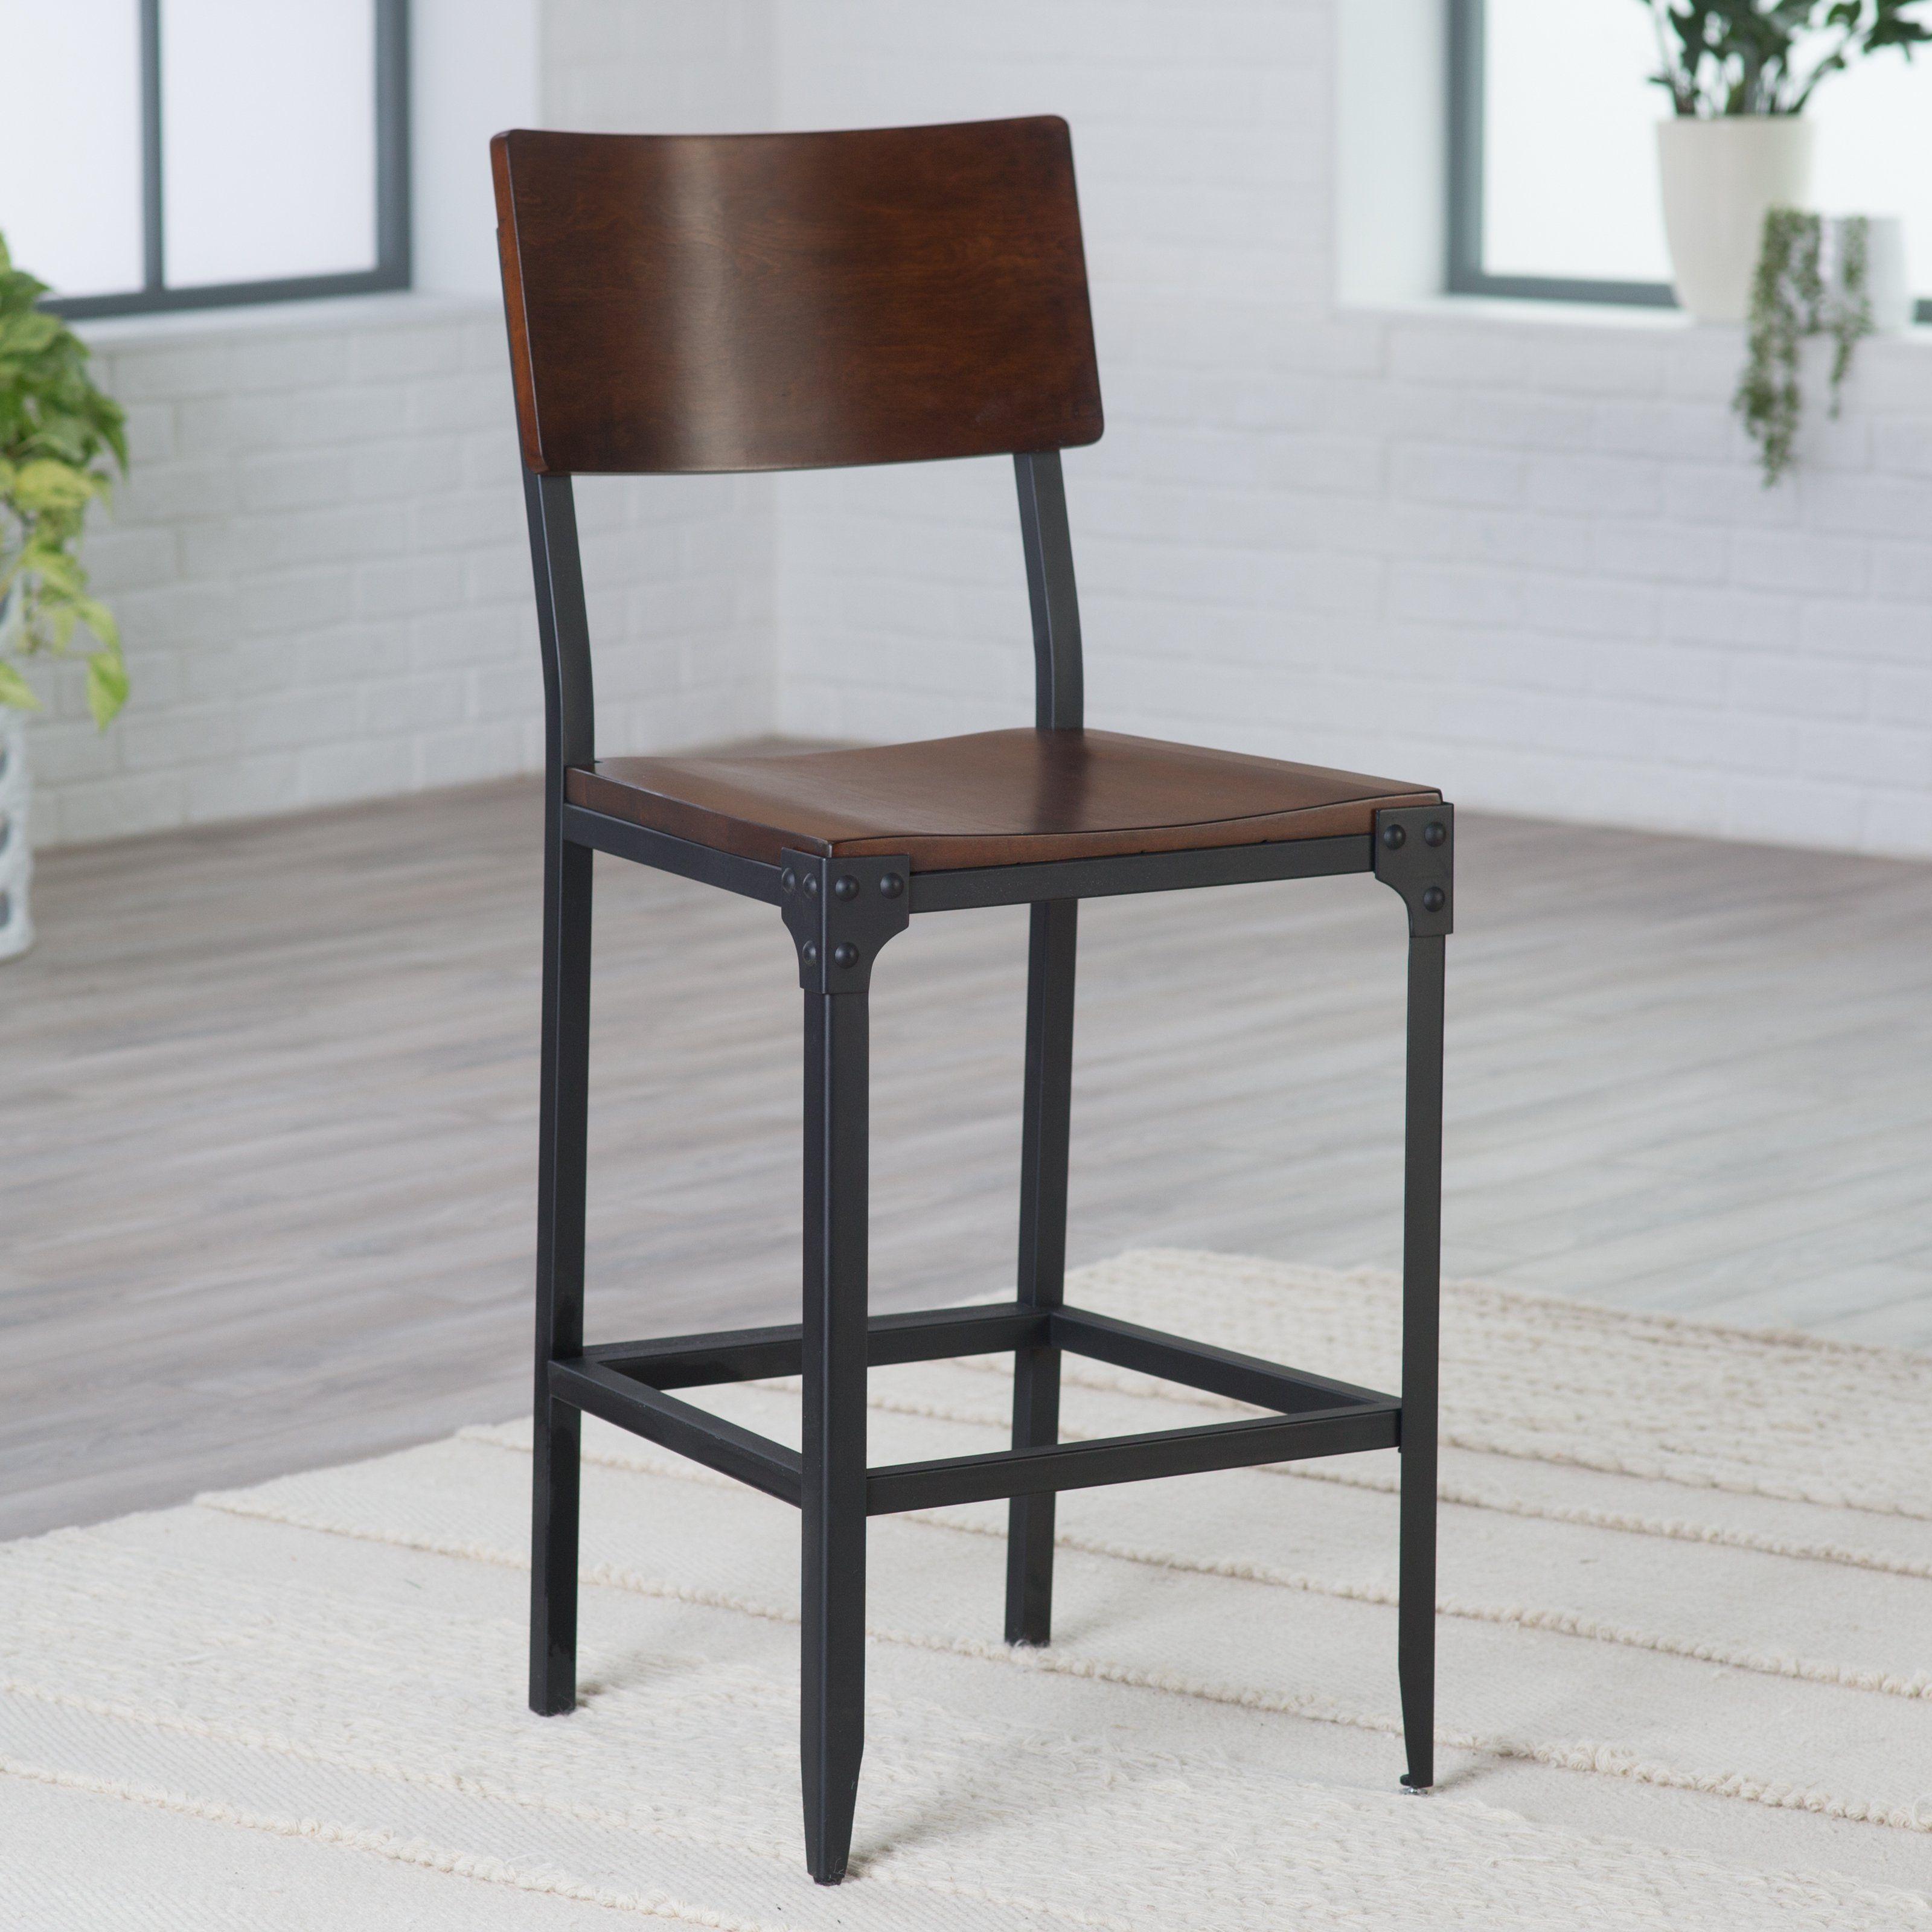 Belham living trenton wood and metal counter stool rh151002 26h